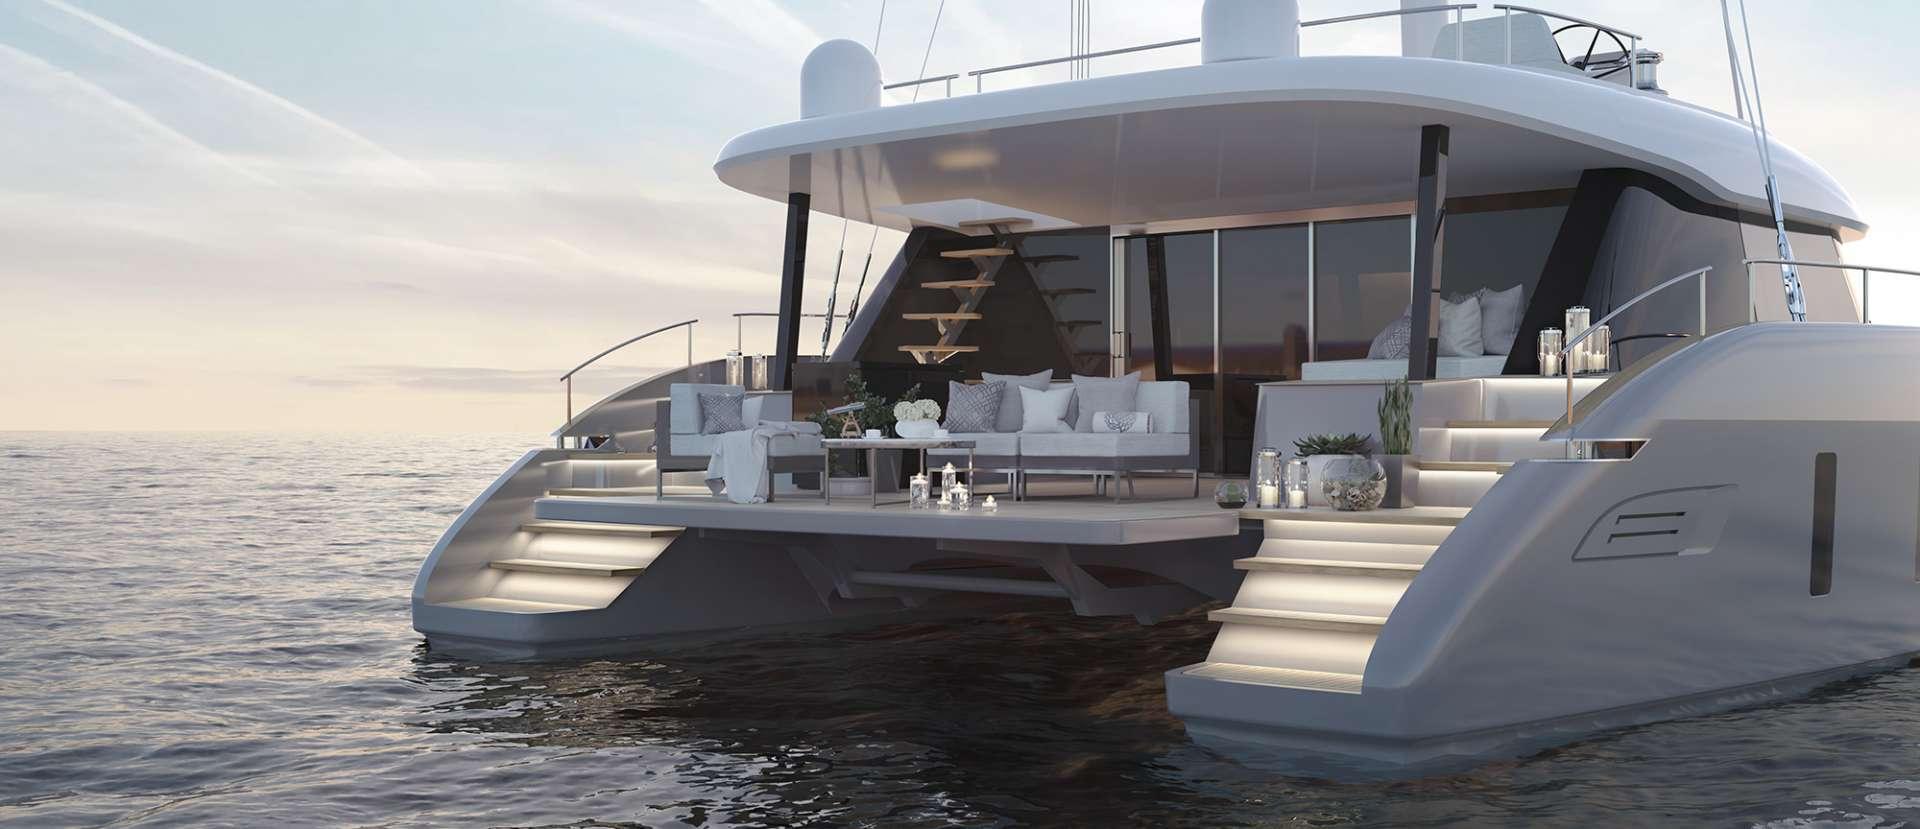 Catamaran Tiril